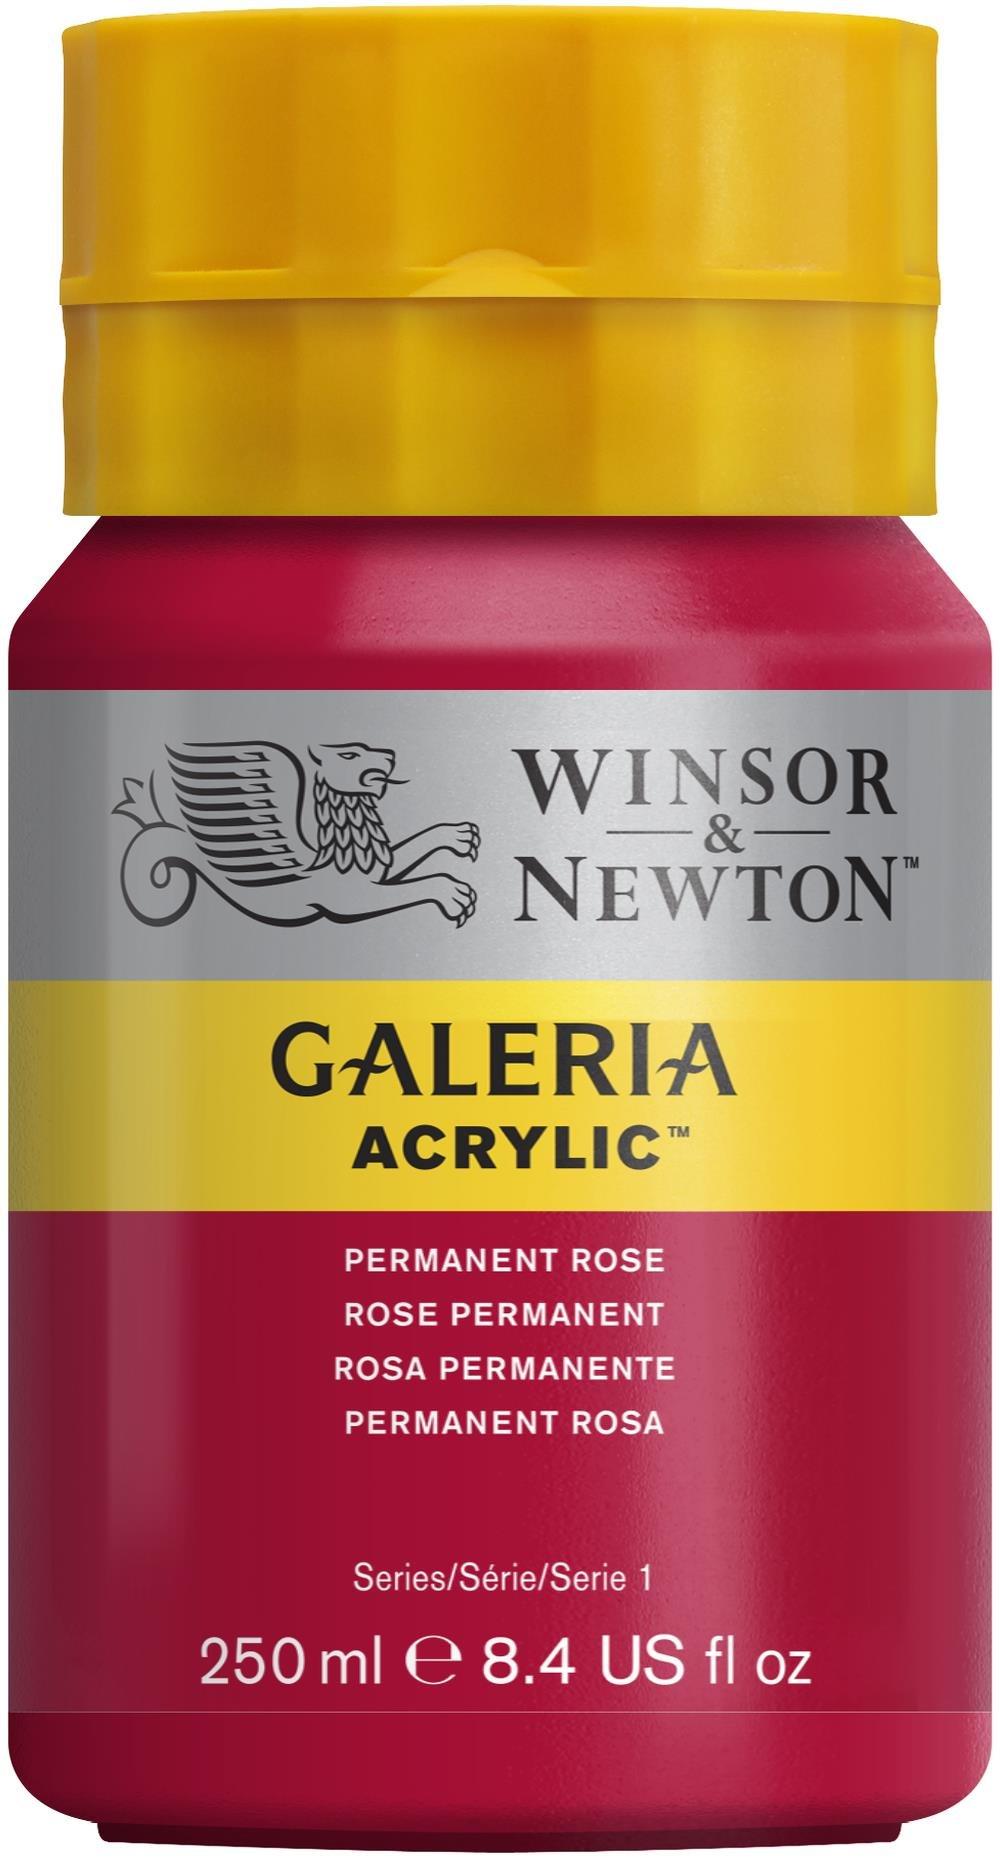 Winsor & Newton Galeria Acrylic Paint, 250ml Bottle, Permanent Rose